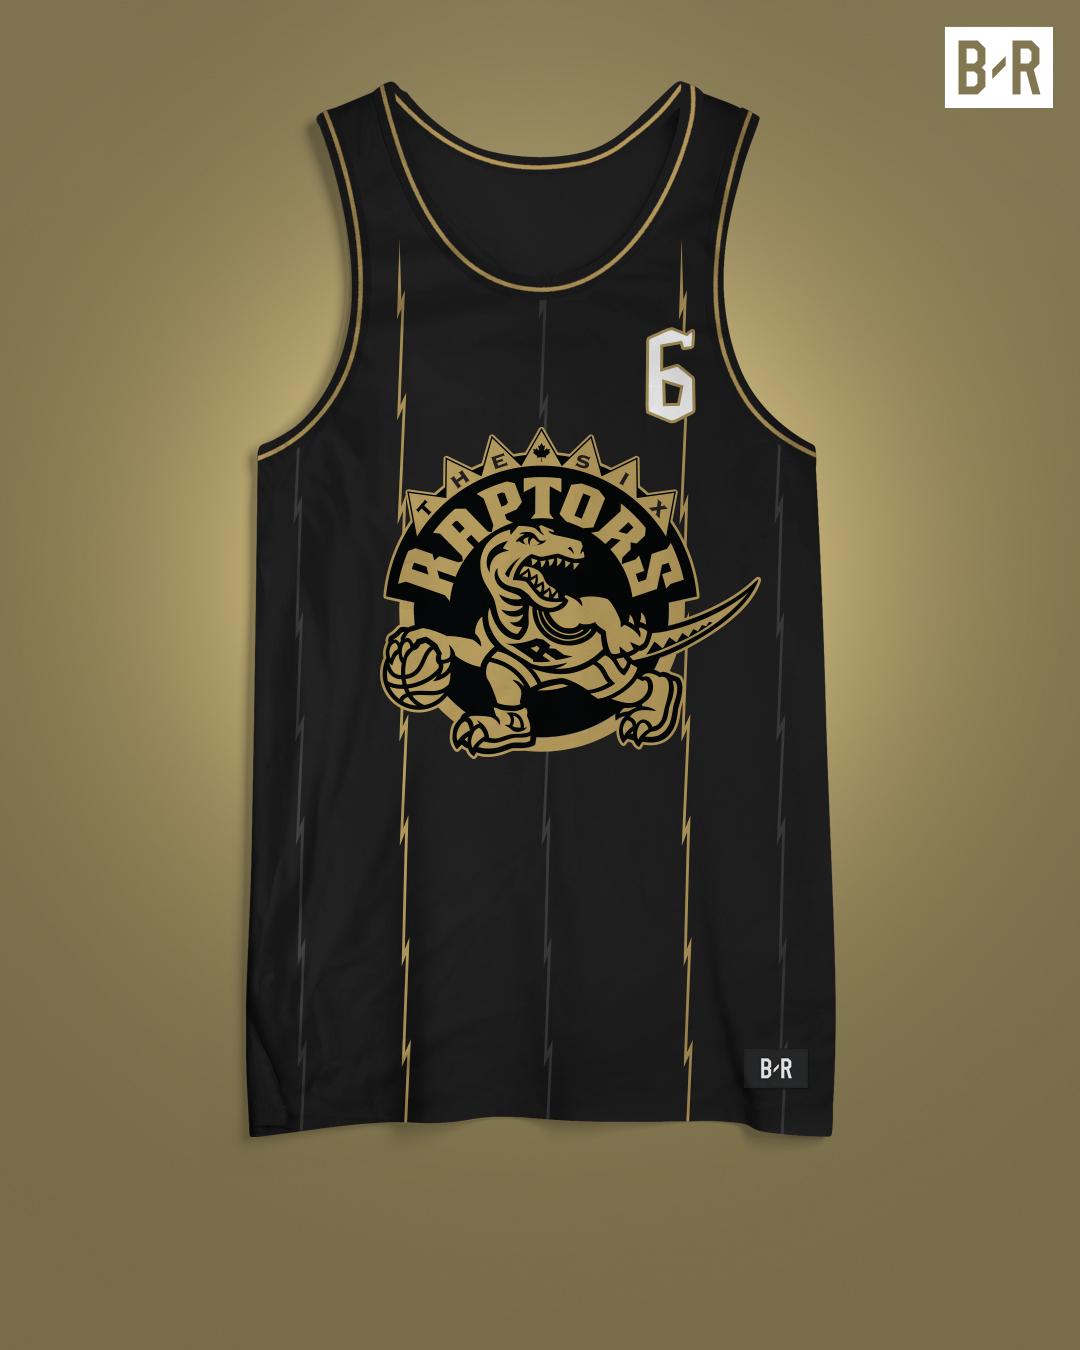 Raptors Jersey skinnier pattern dark.jpg